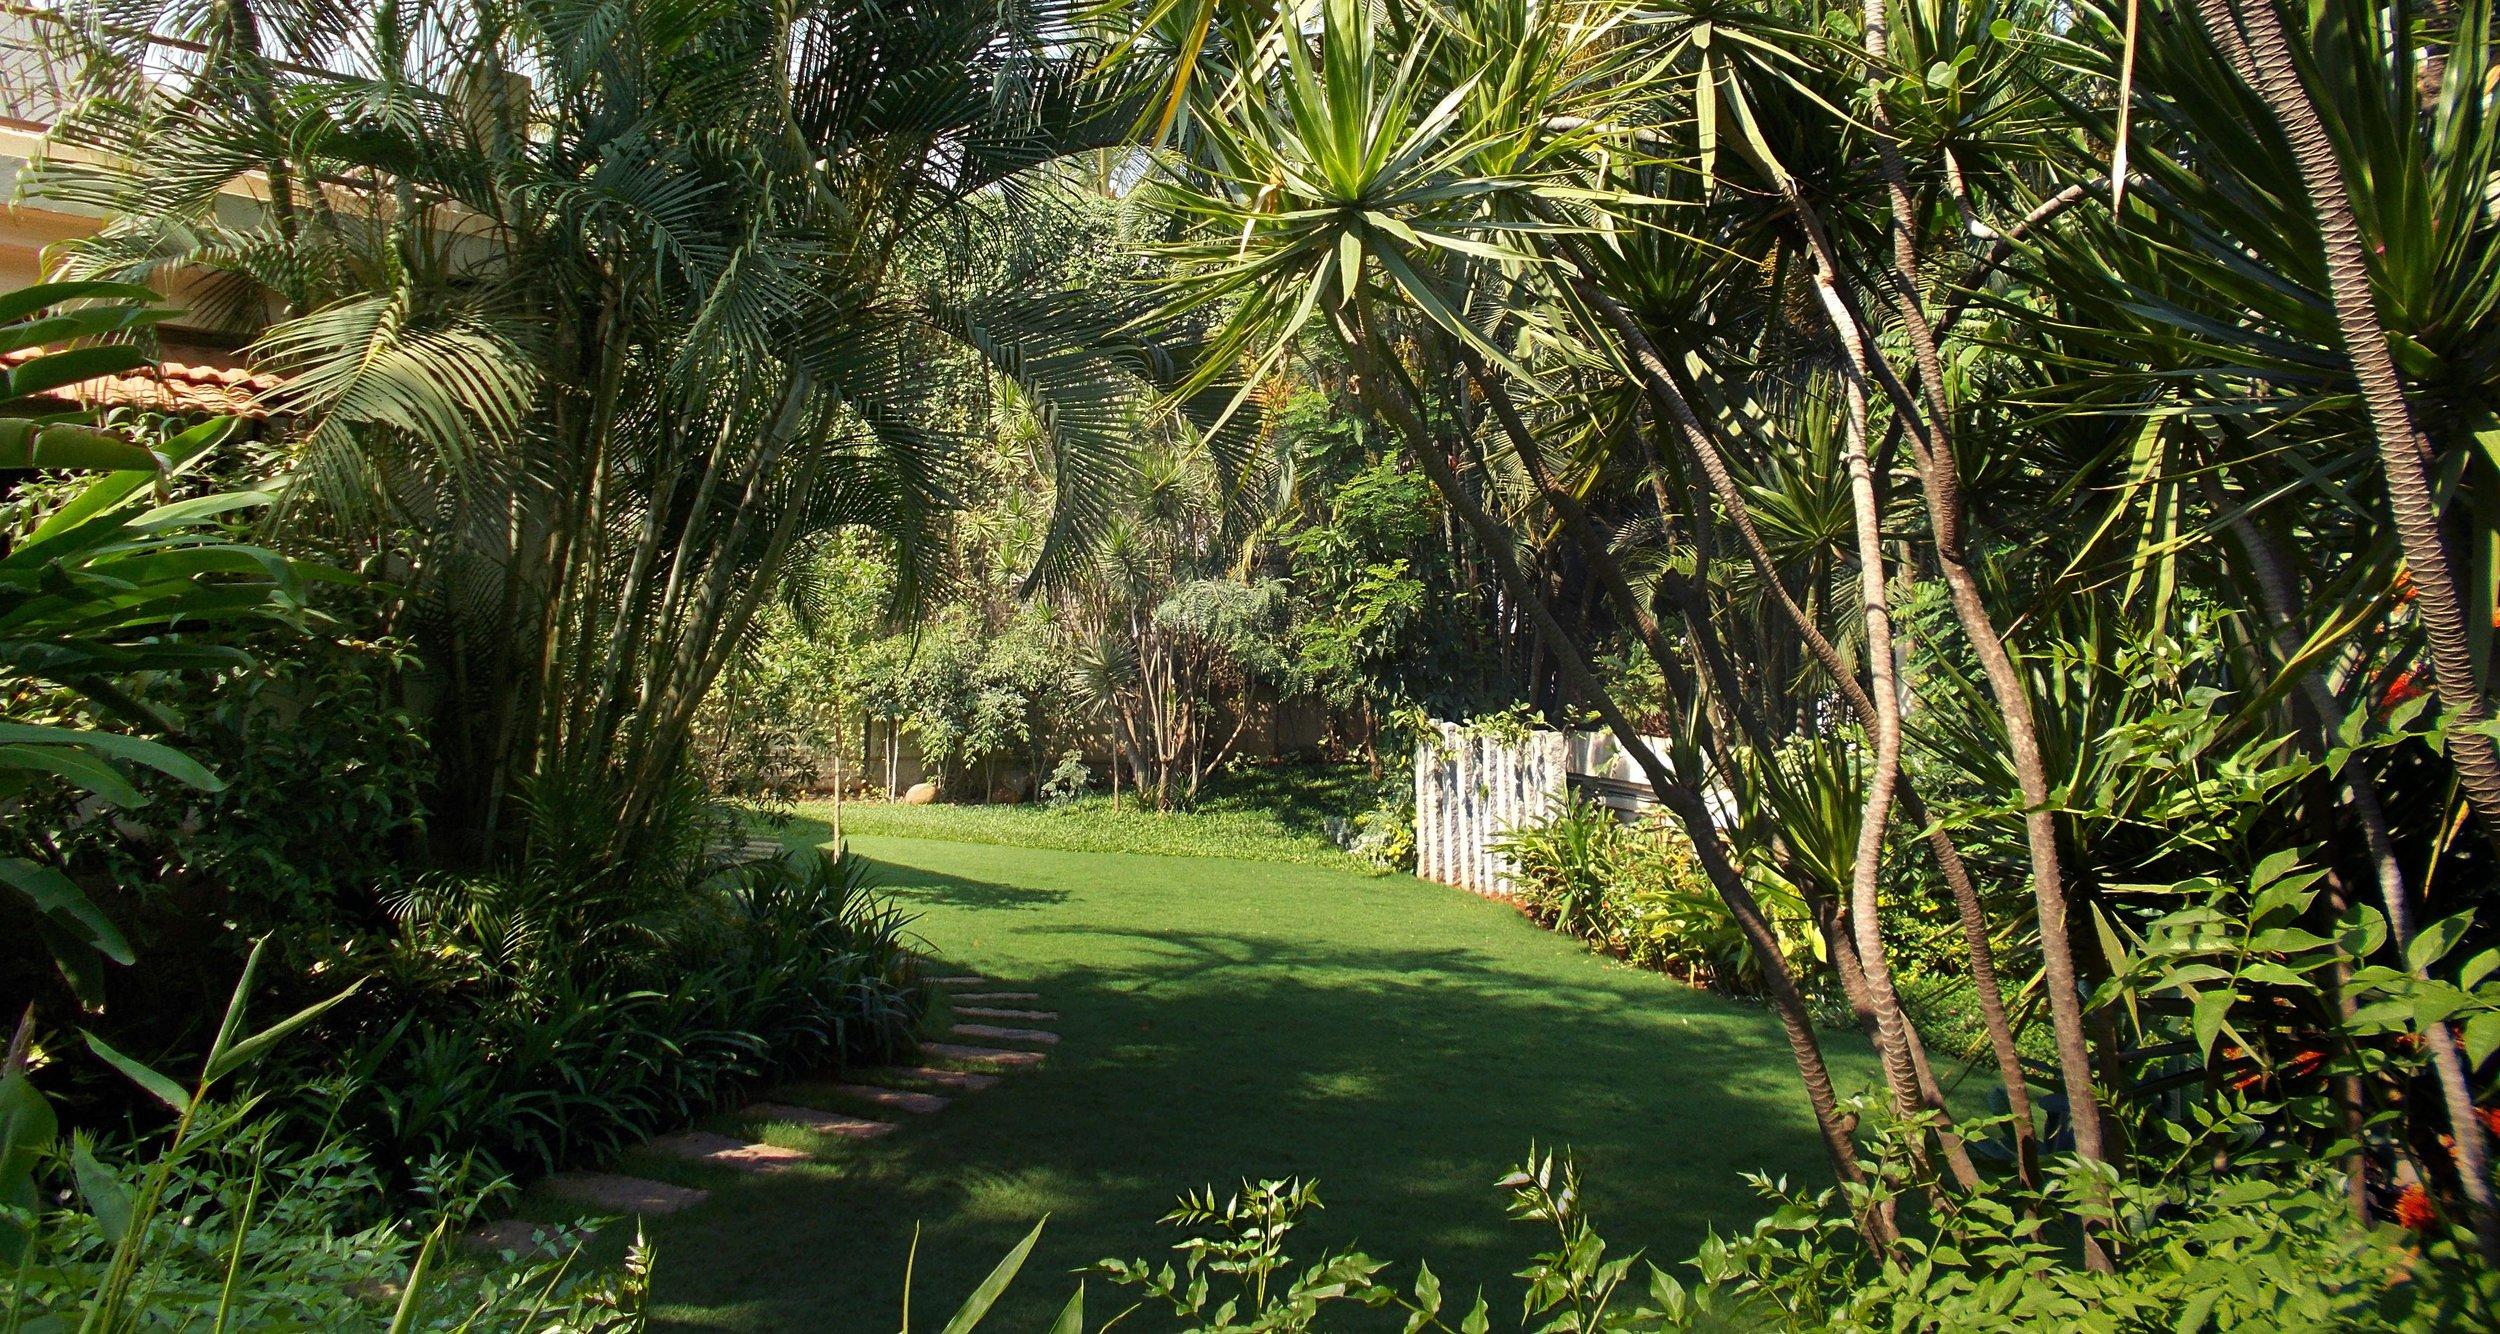 Ficus-landscape-bangalore-villa-kanak-backyard-garden-02